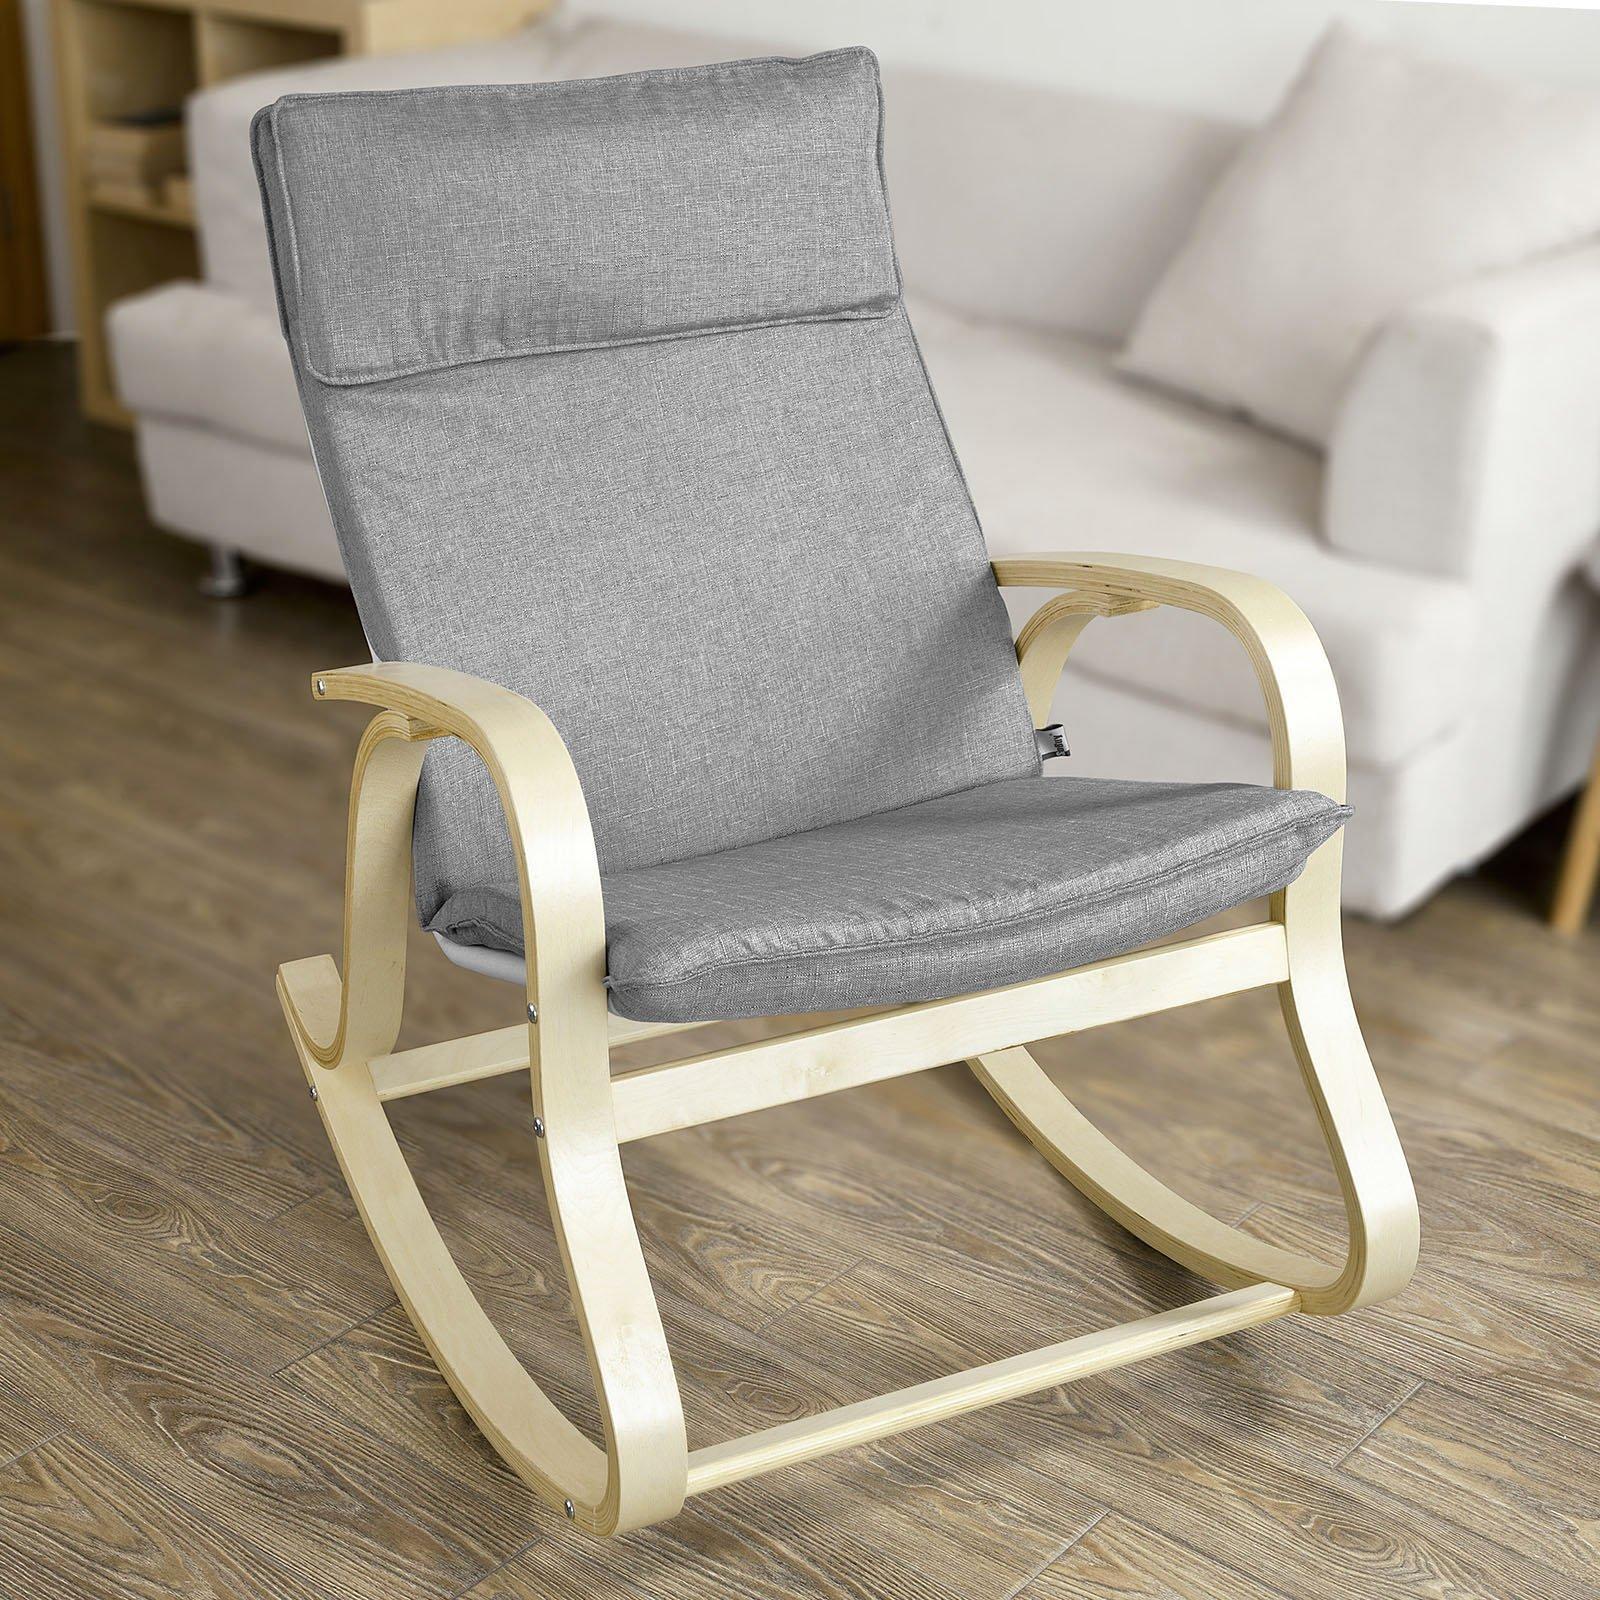 Haotian FST15 DG Comfortable Rocking Cushion